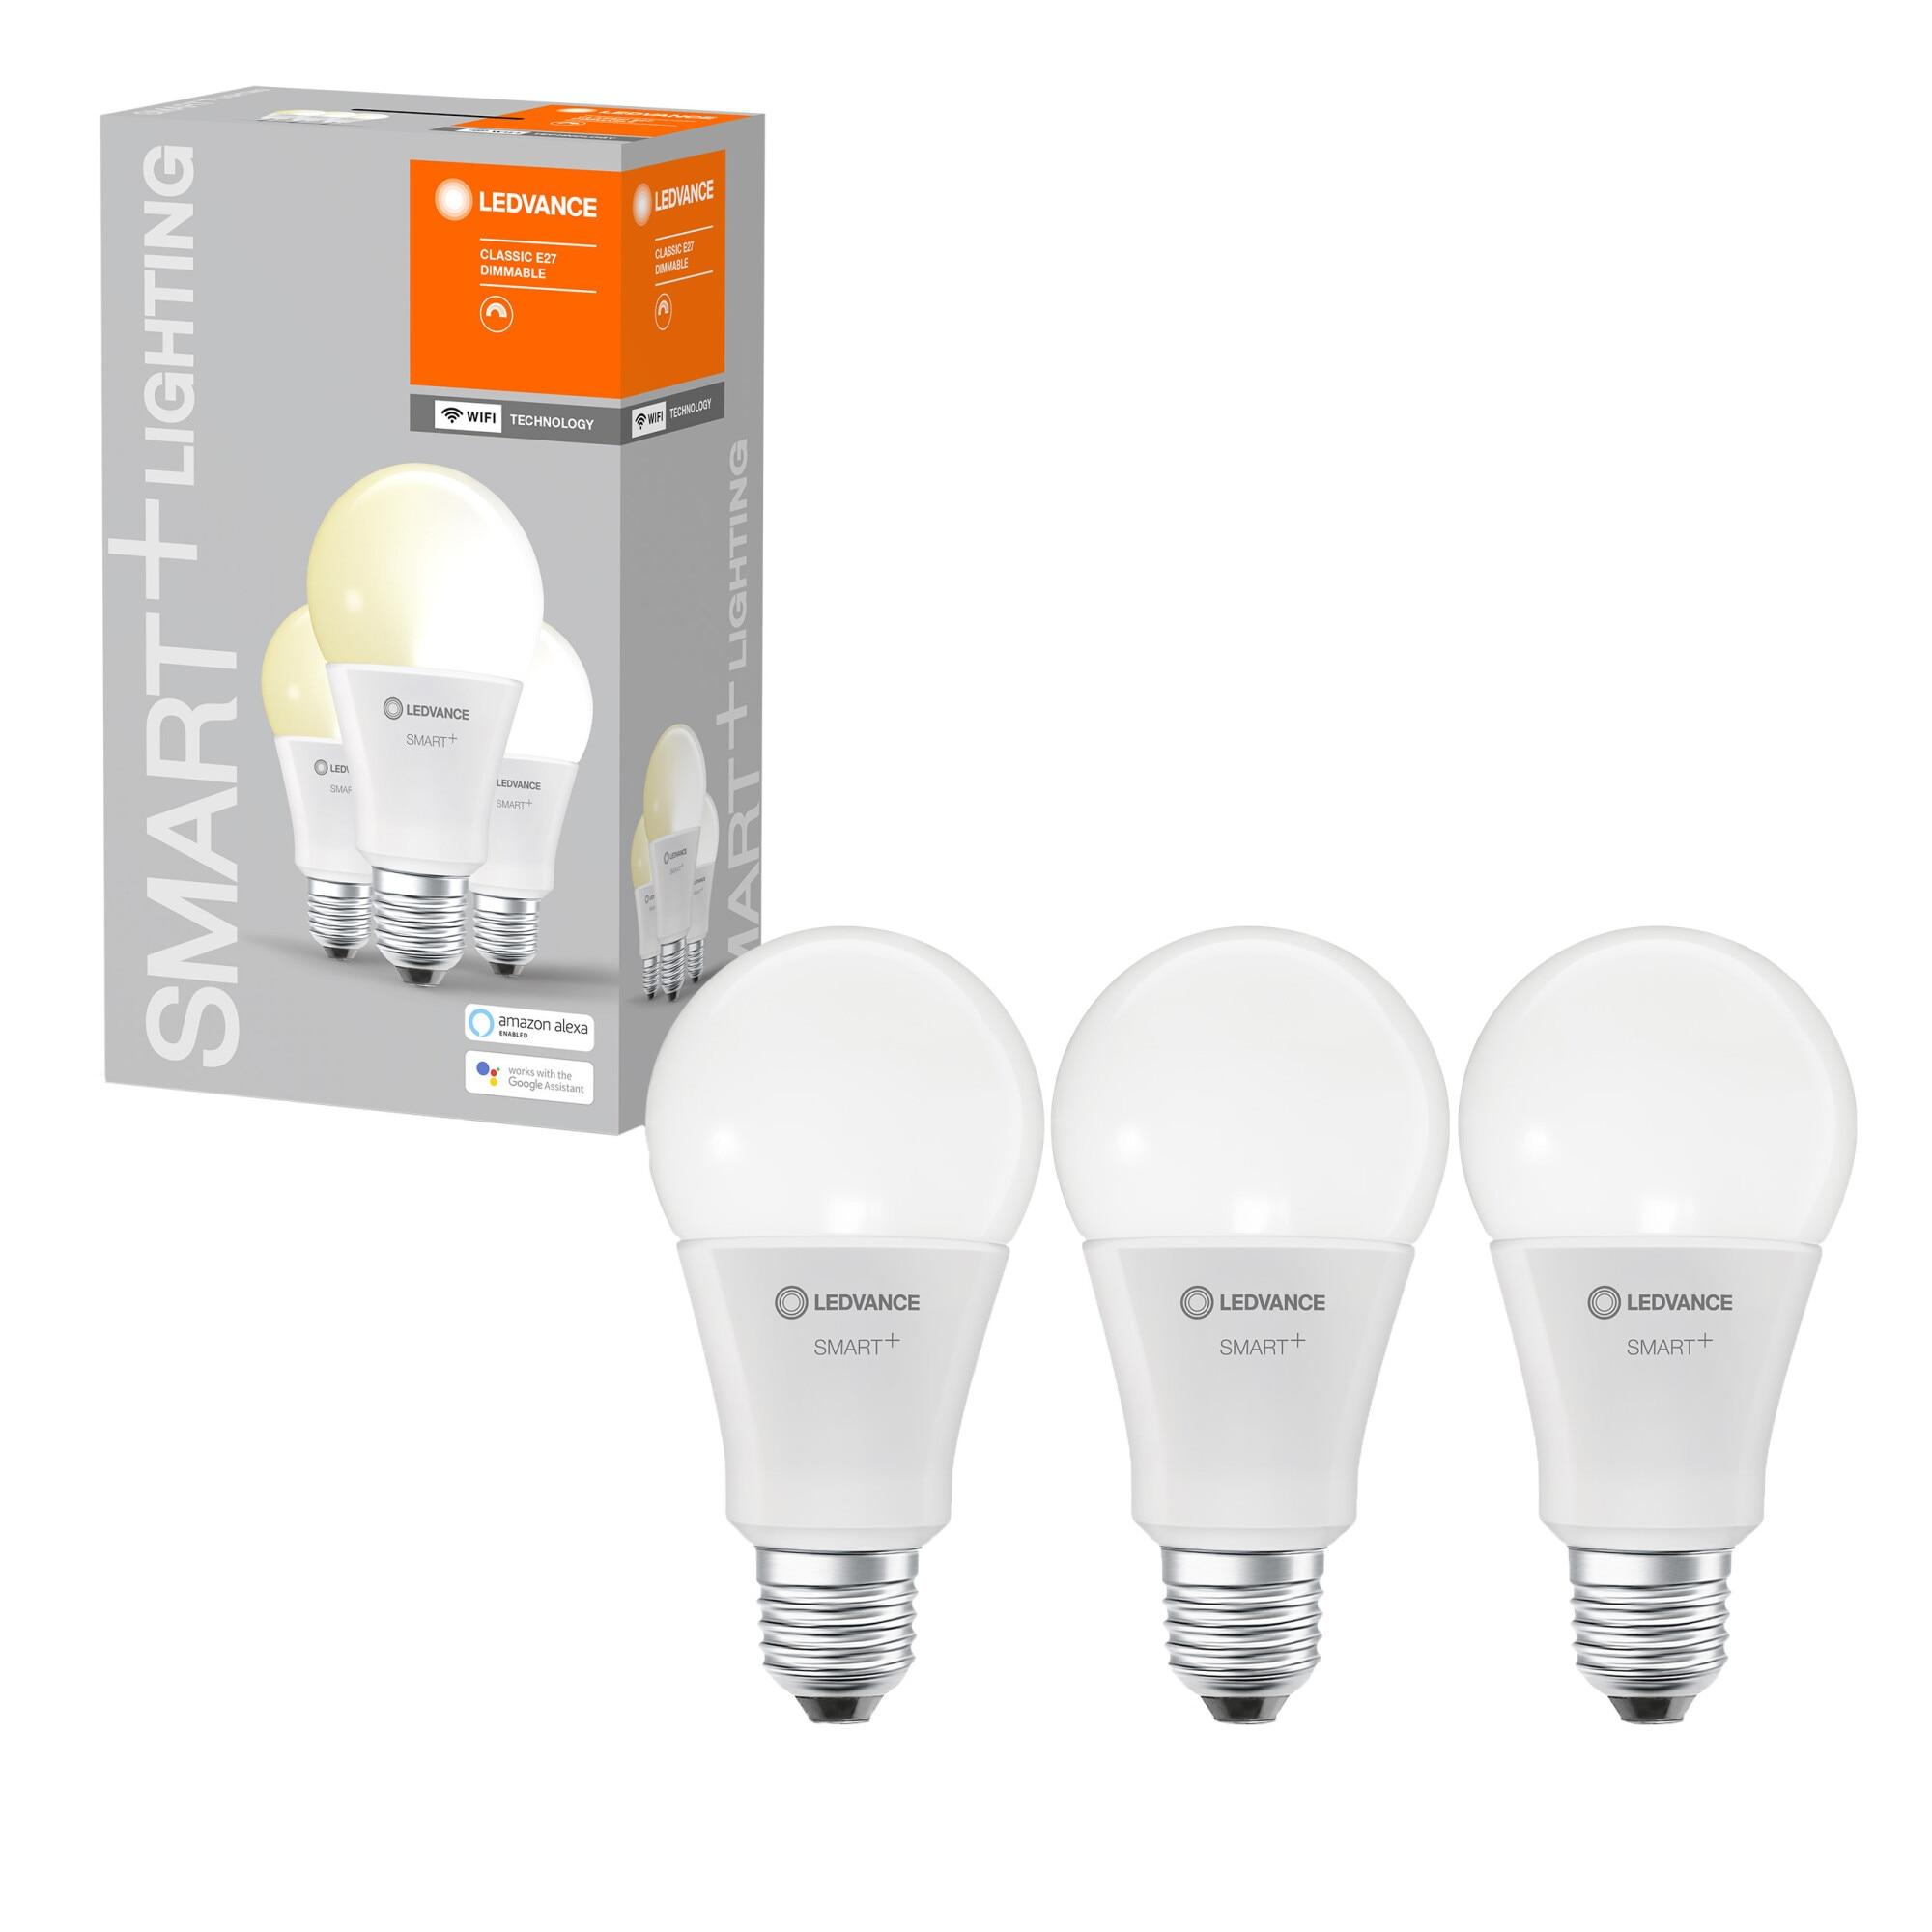 Fotografie Pachet 3 becuri inteligente LED LEDVANCE SMART WIFI, A100, 14W (100W), 1521 lm, dimabil, temperatura lumina calda (2700K), compatibil amazon alexa/Google Assistant